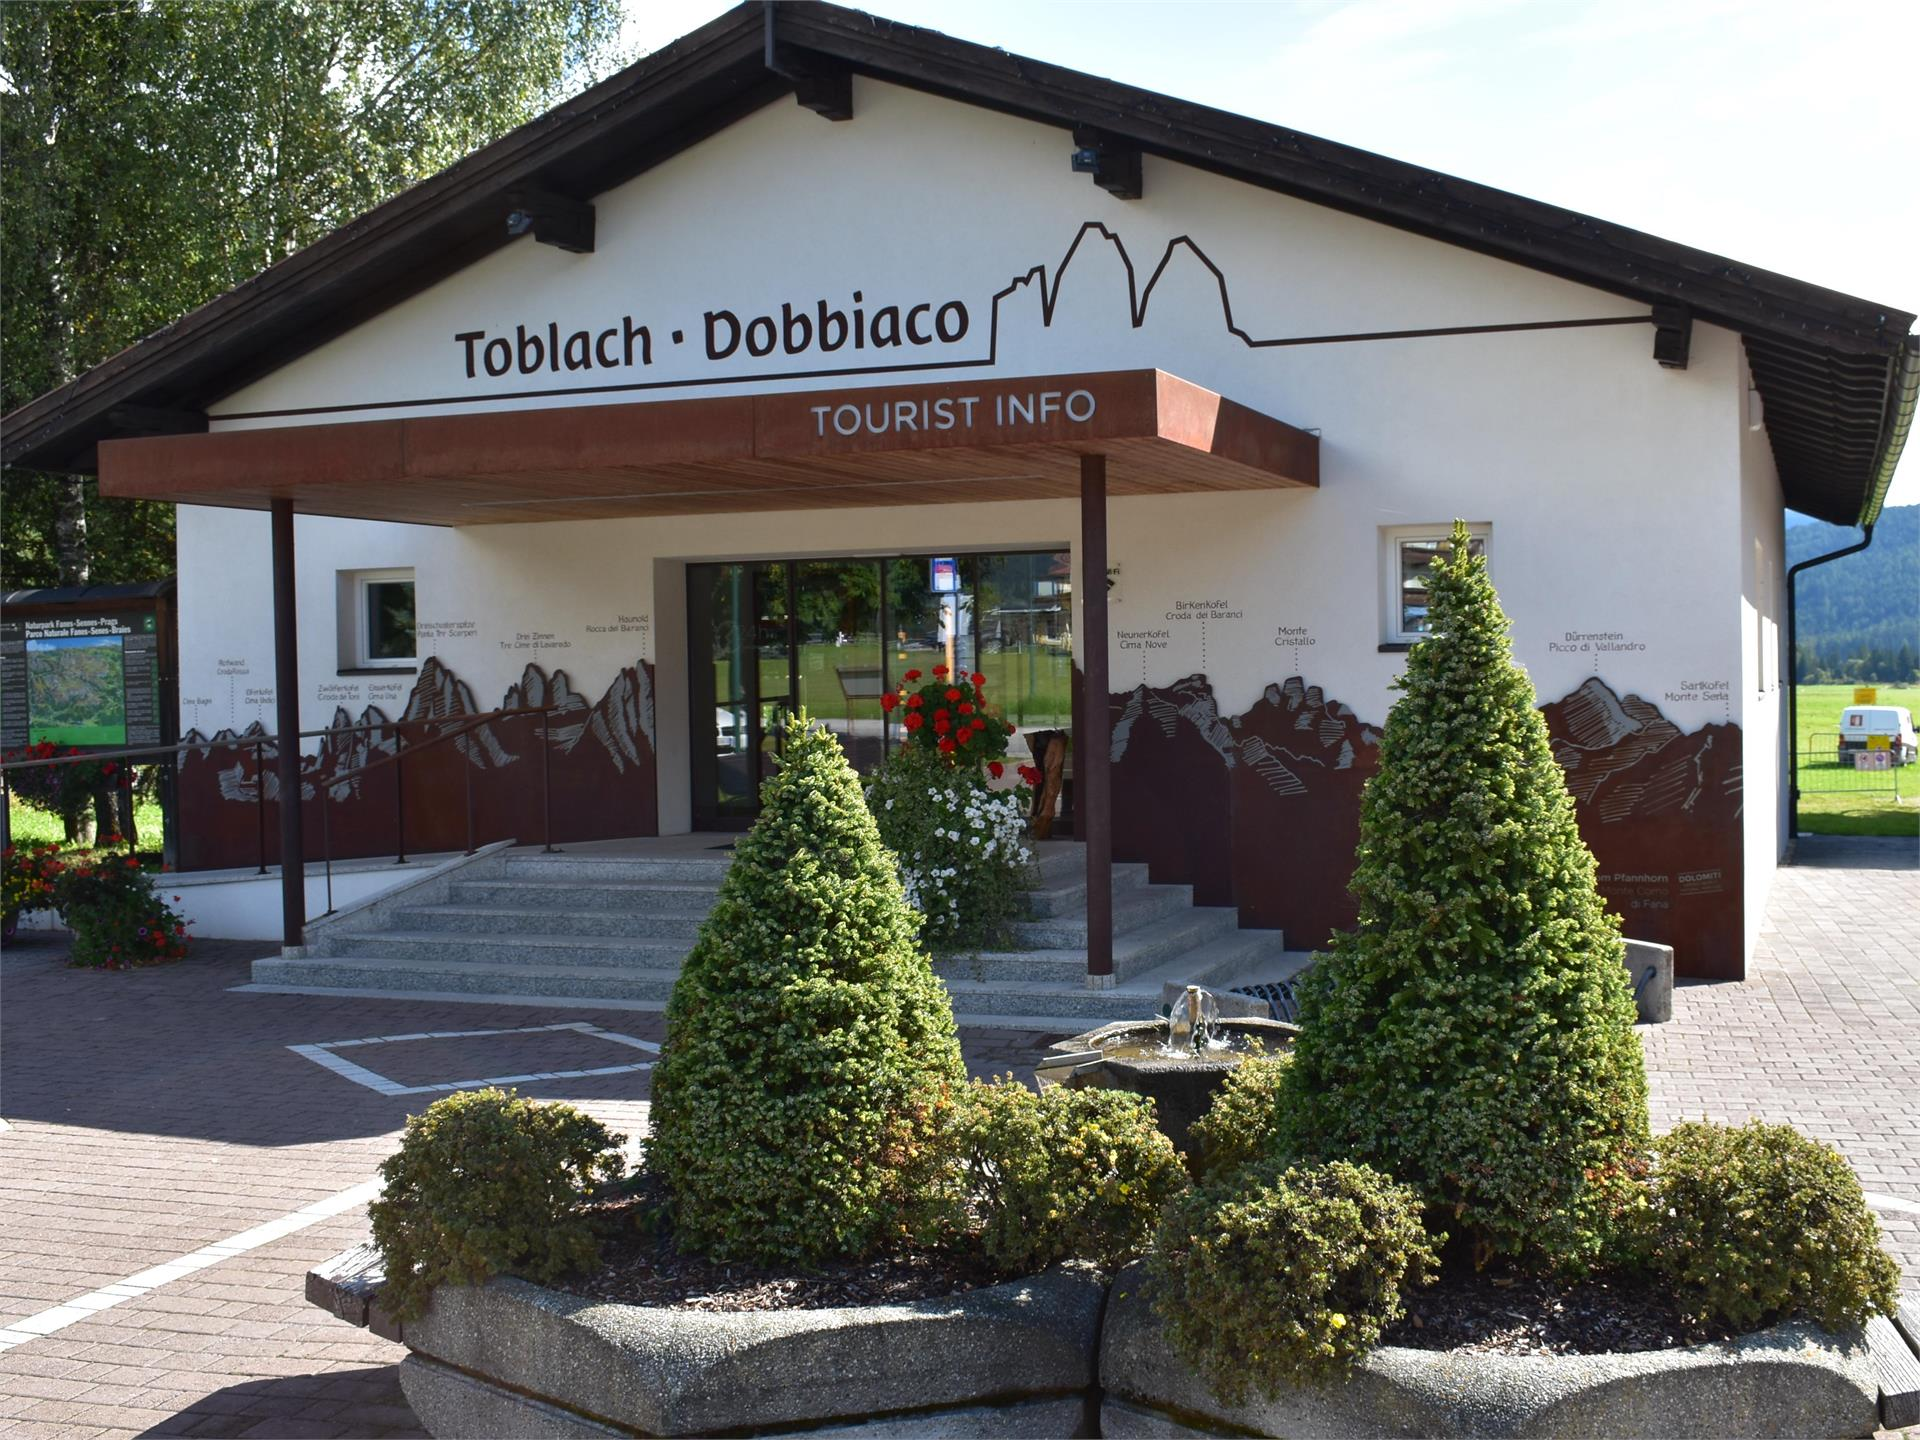 Tourismusbüro Toblach